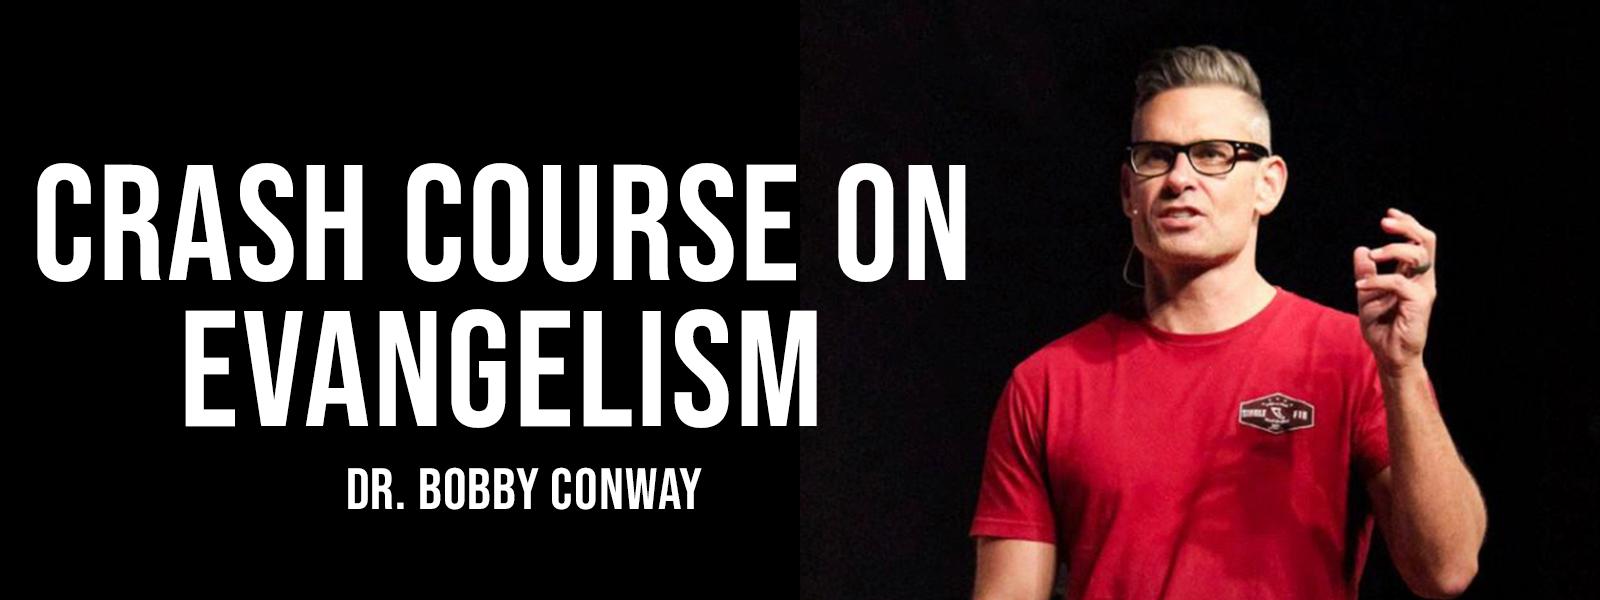 Crash Course On Evangelism Banner